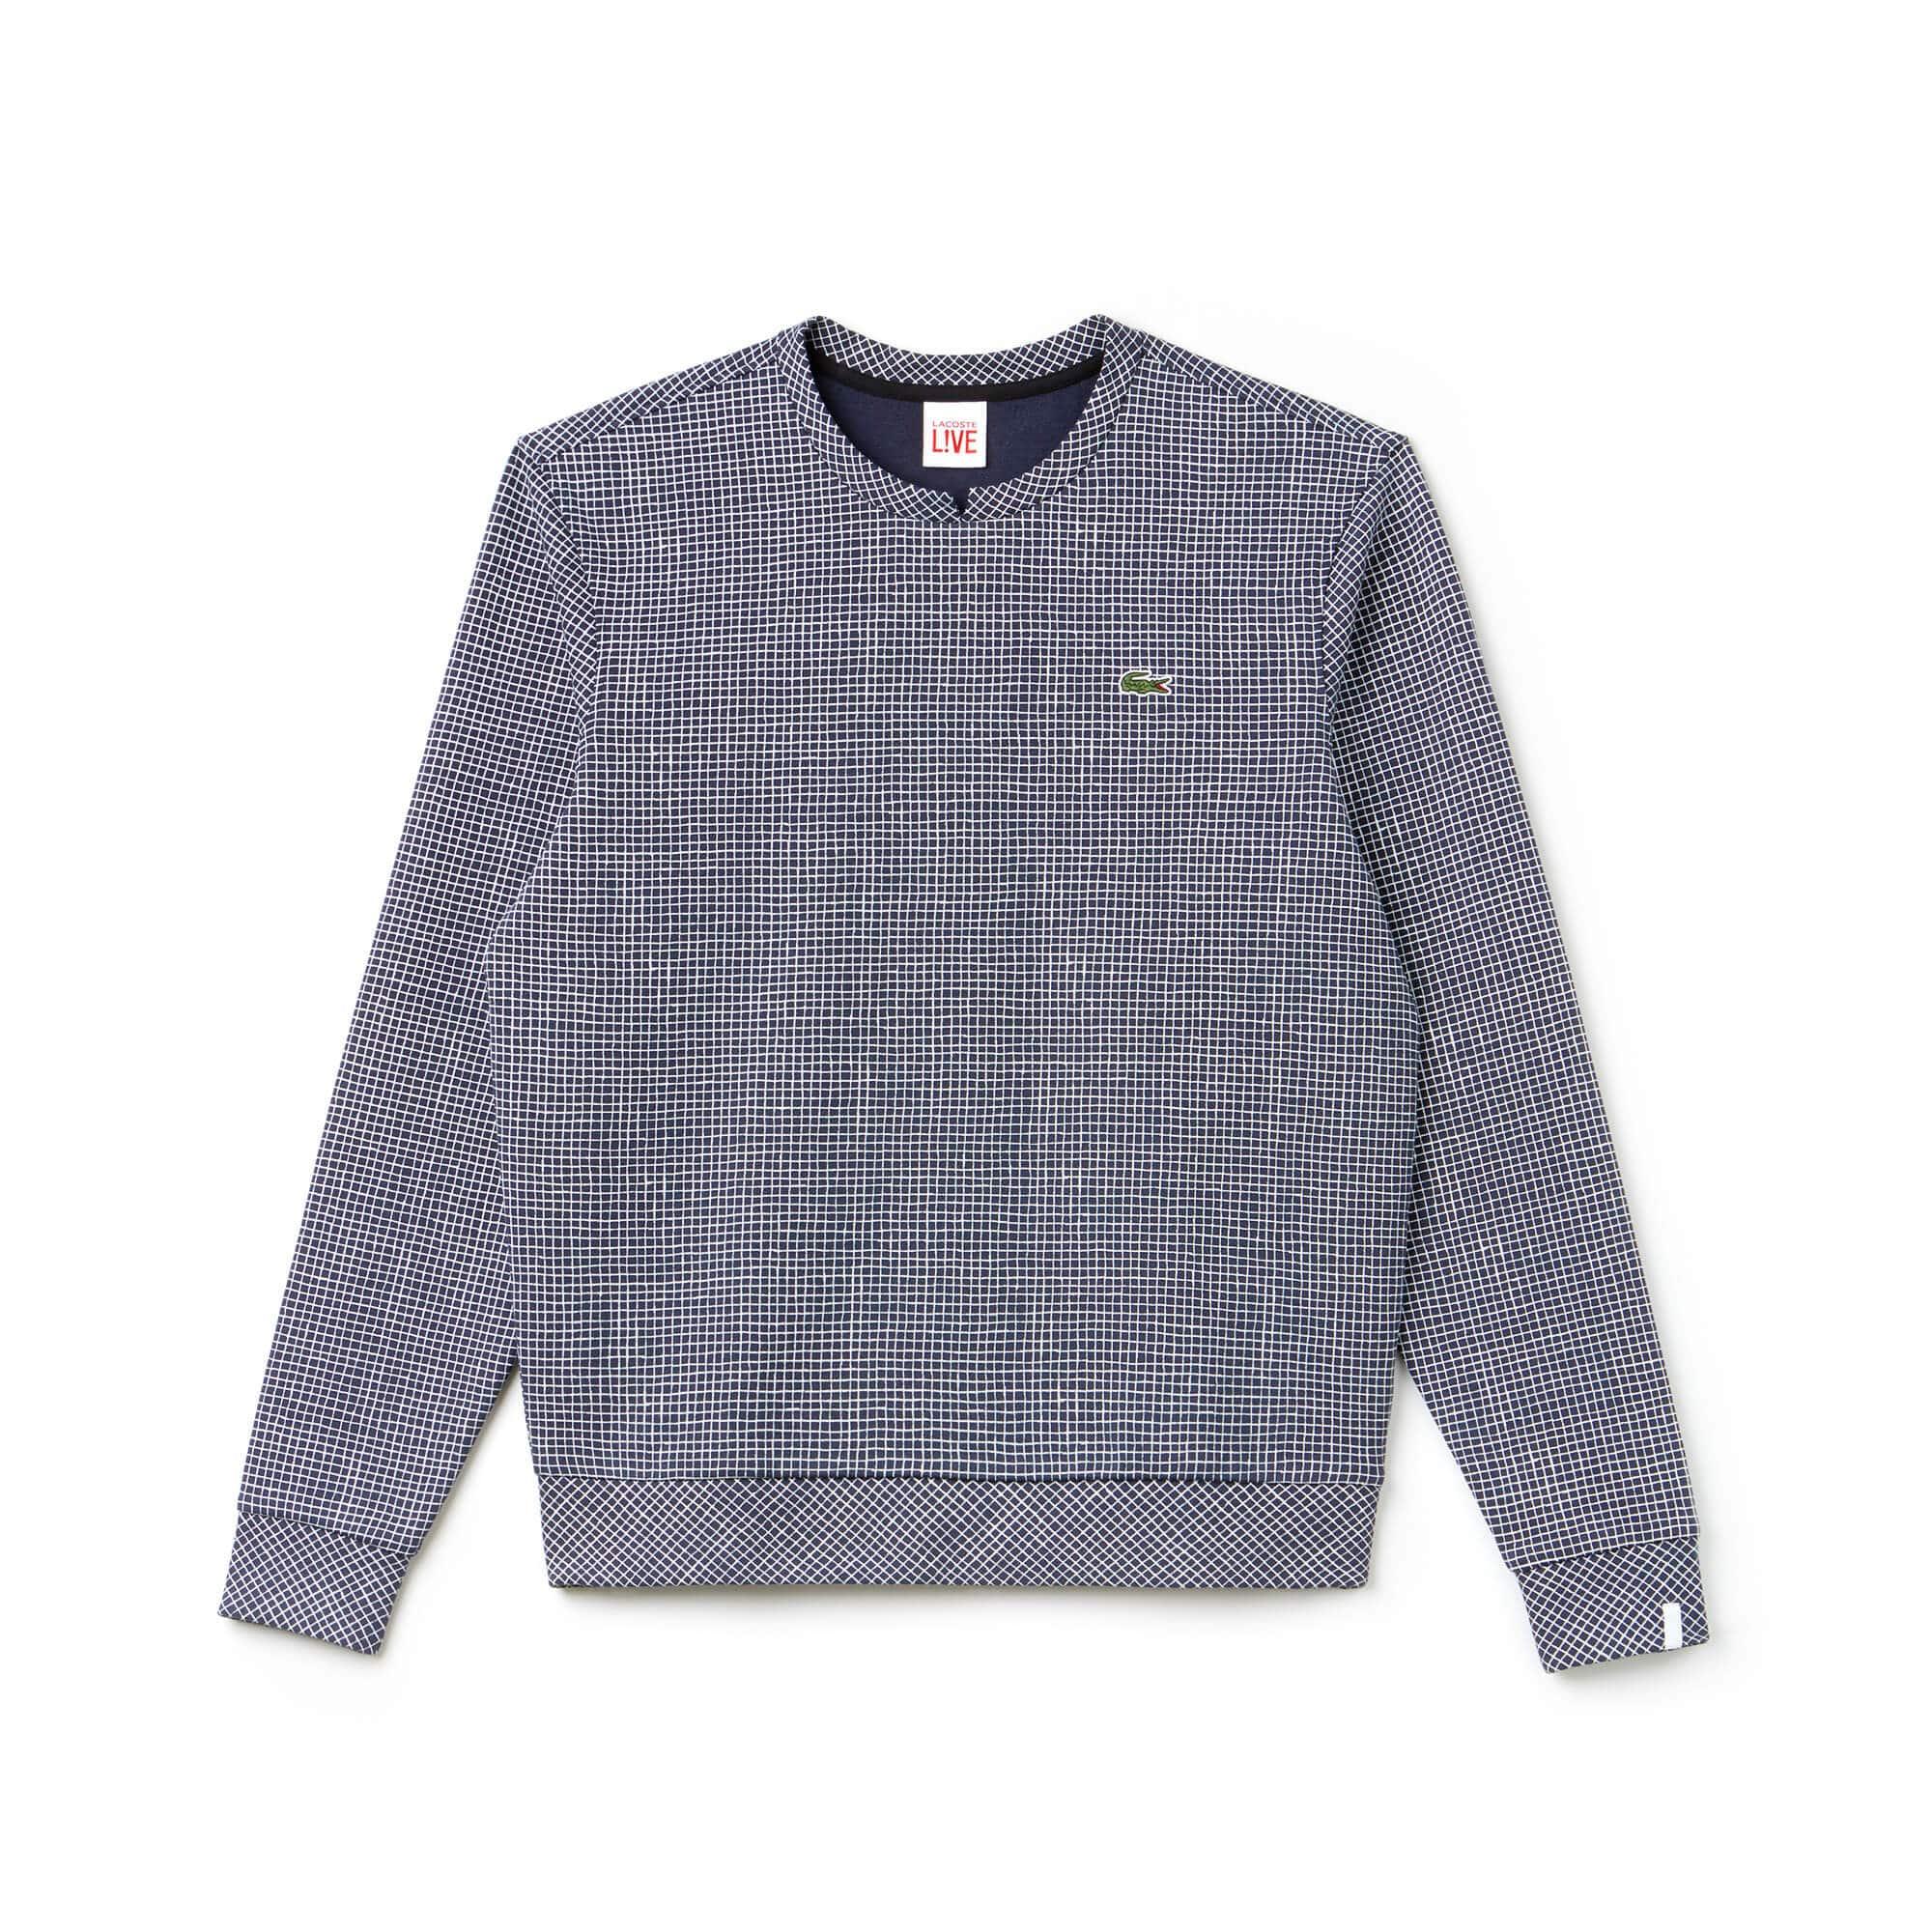 Men's Lacoste LIVE Crew Neck Mini Check Fleece Sweatshirt